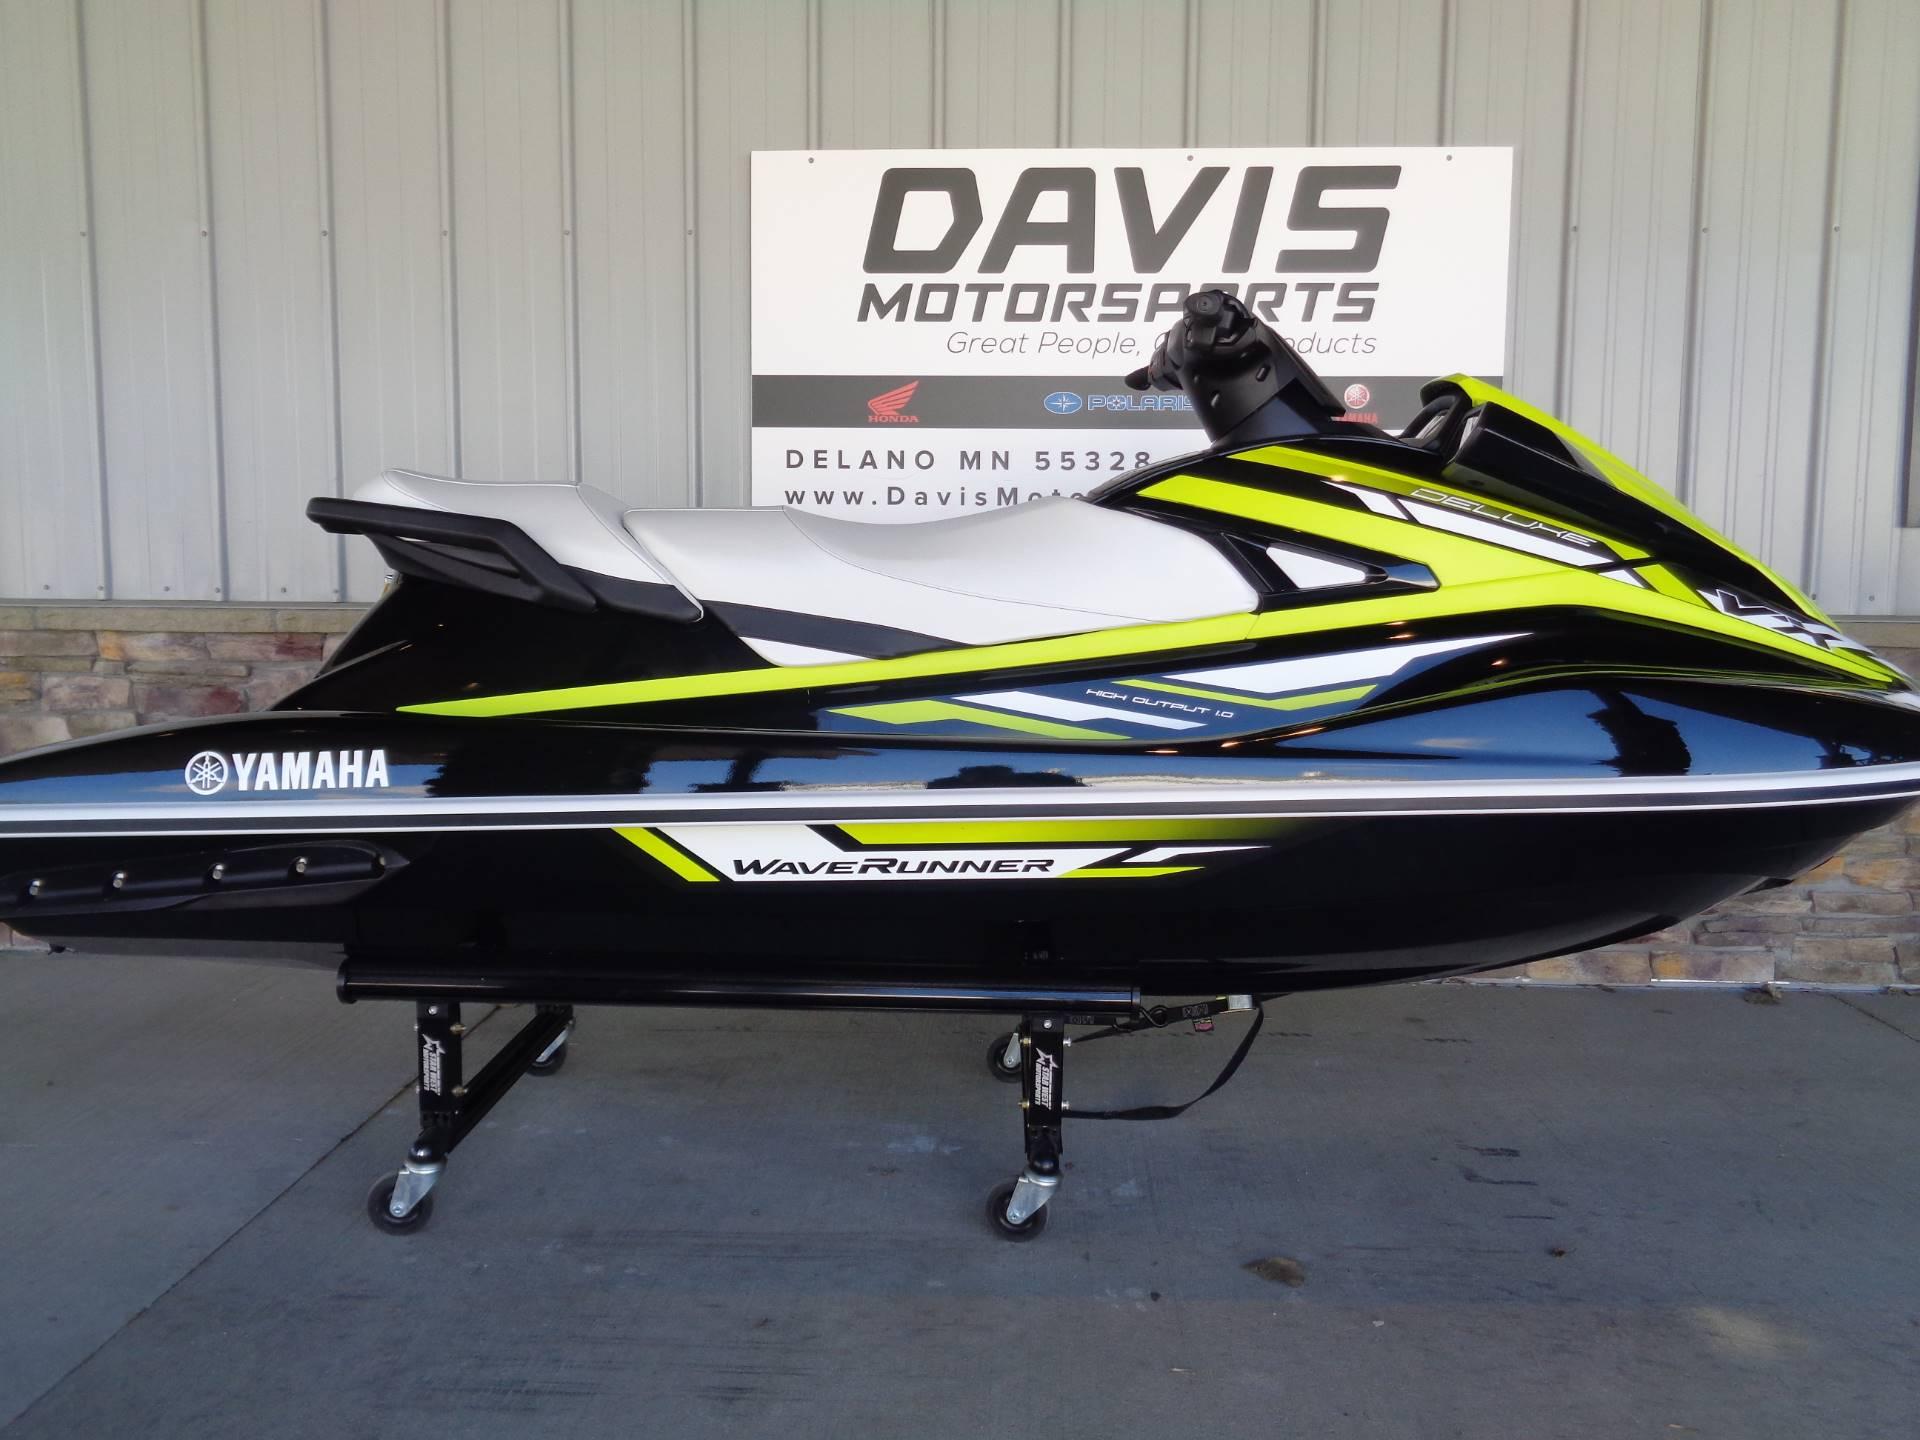 2019 Yamaha VX Deluxe in Delano, Minnesota